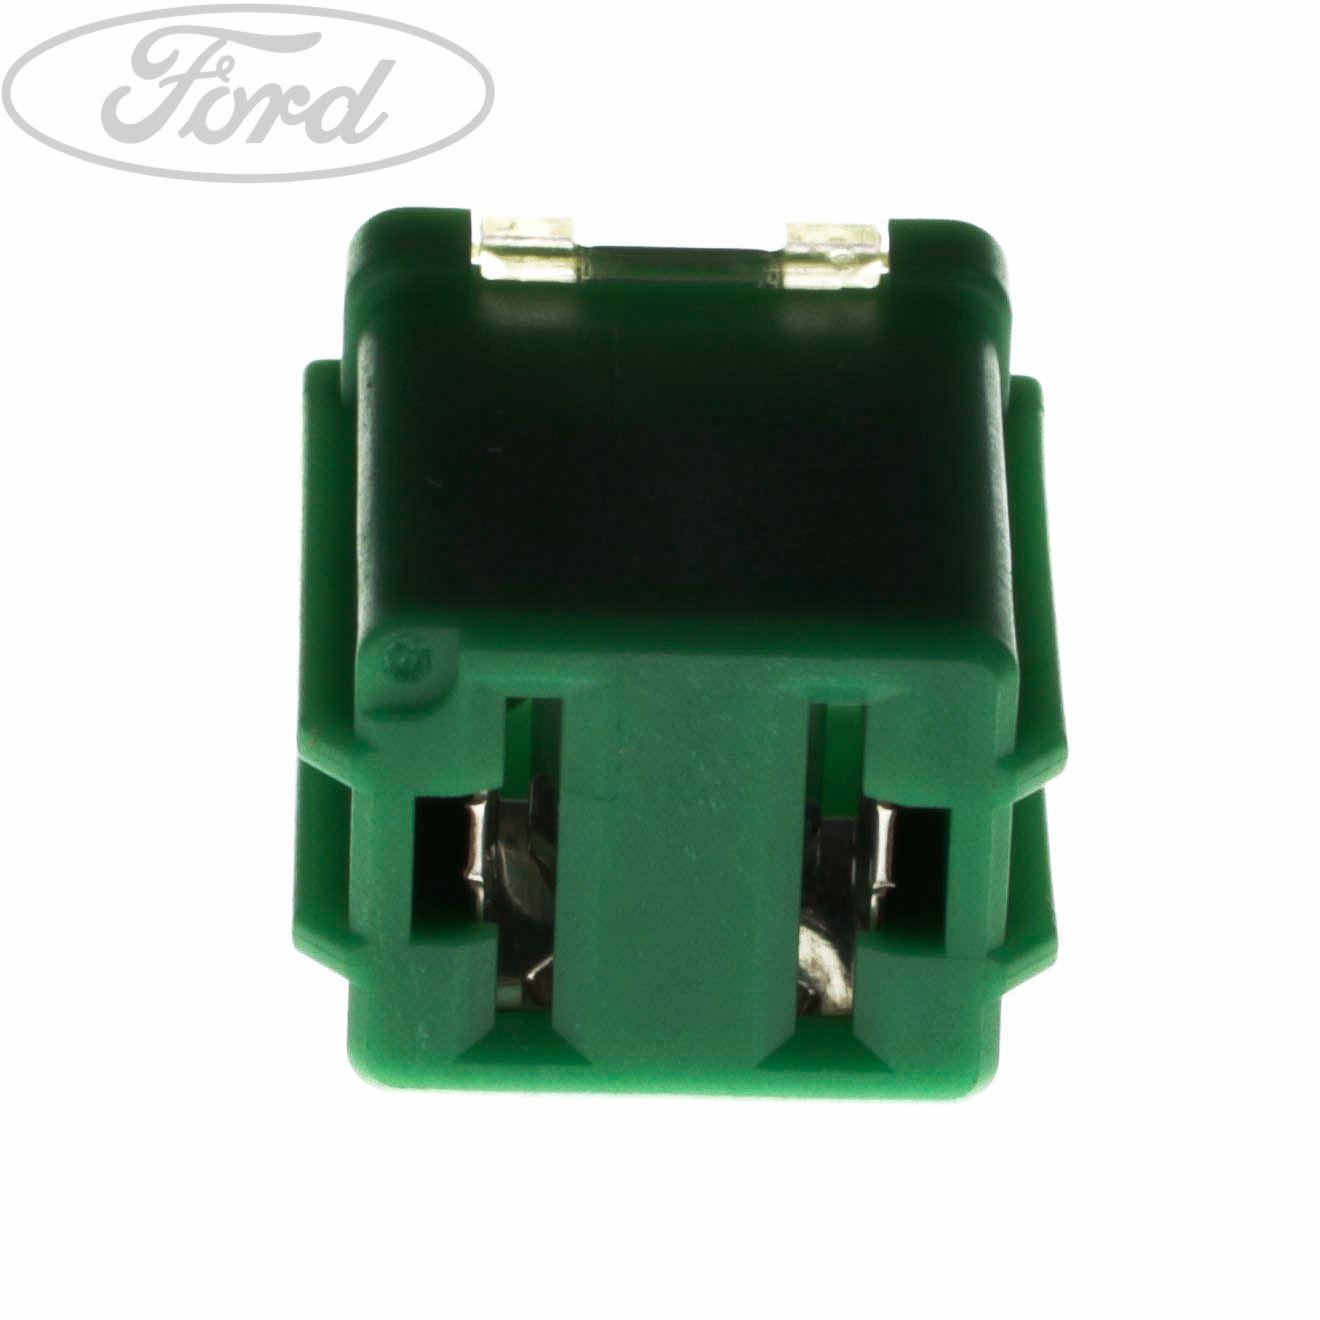 Genuine Ford Fiesta Mk7 40 Amp Fuse 4655704